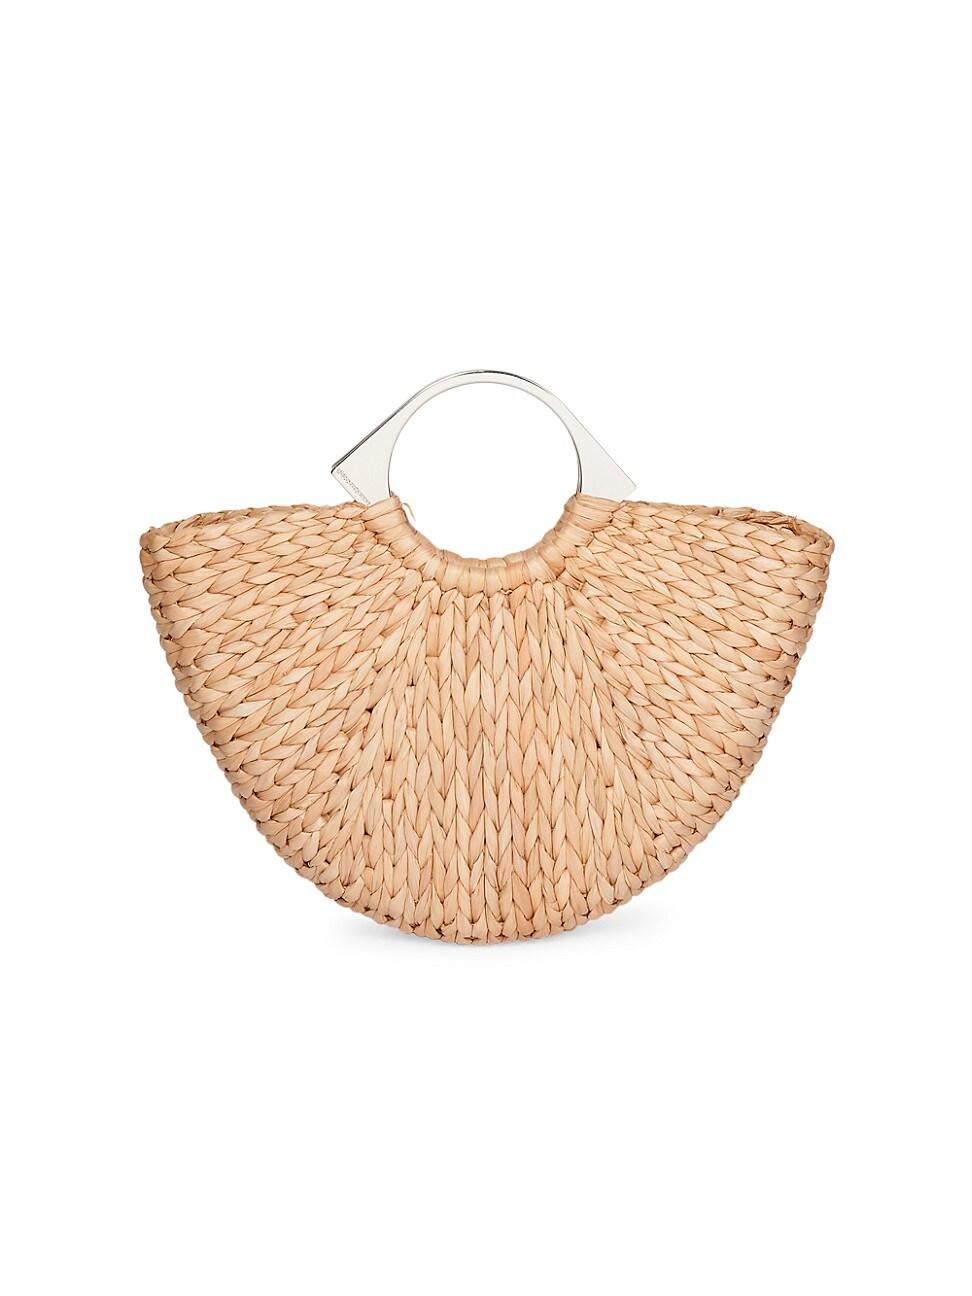 Paco Rabanne Women's Op'art Basket Woven Top Handle Bag In Silver Brown